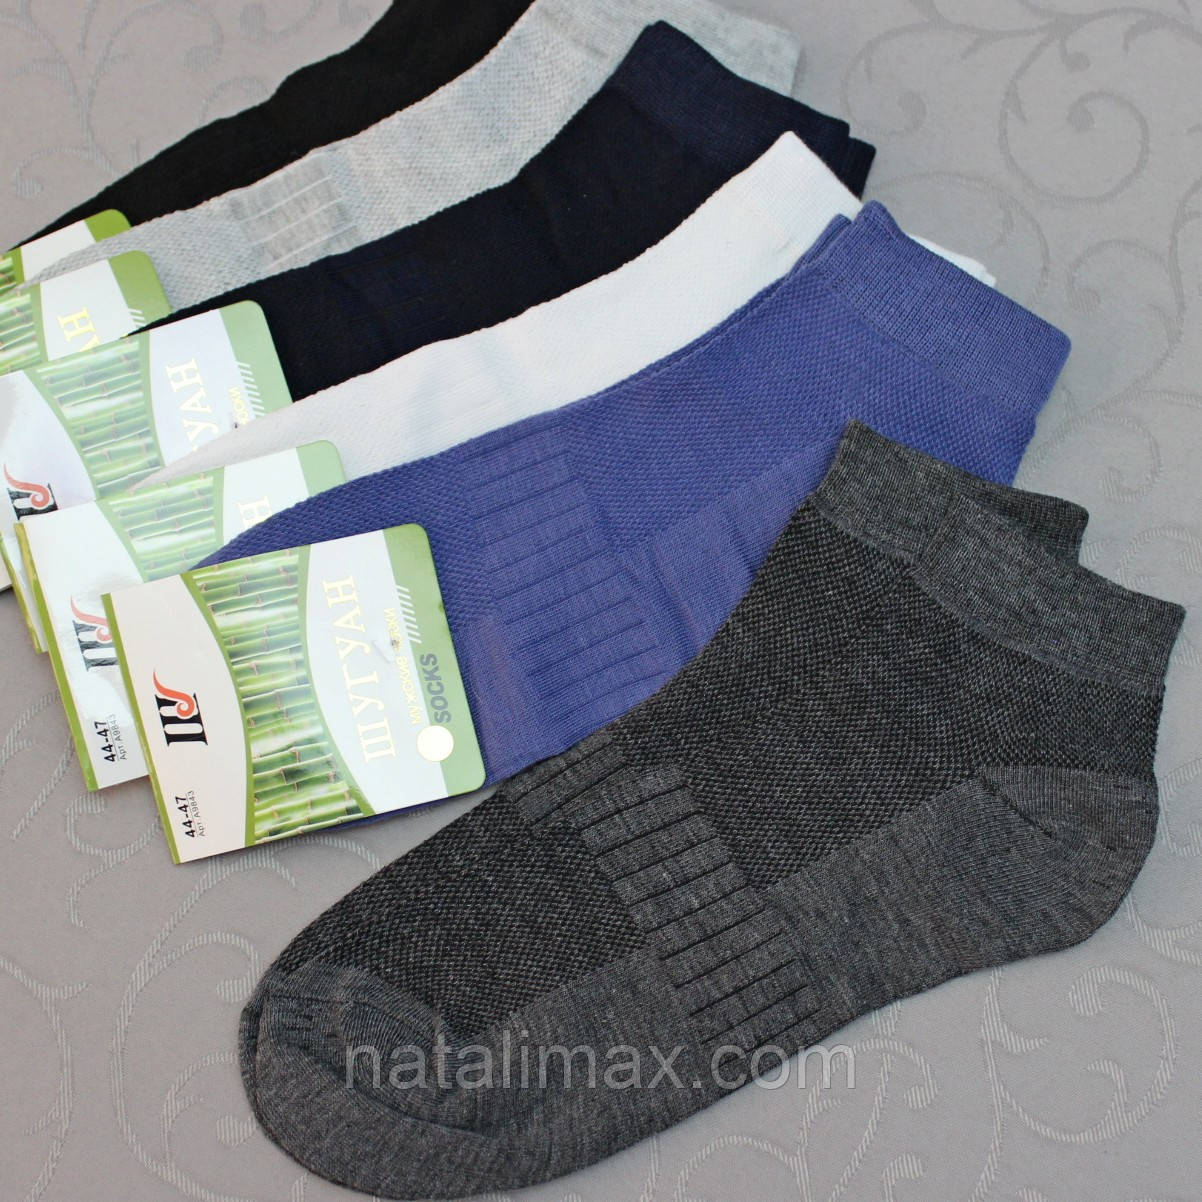 0697ba2a8a139 Носки для мужчин, мужские носки качественные оптом дешево : продажа ...